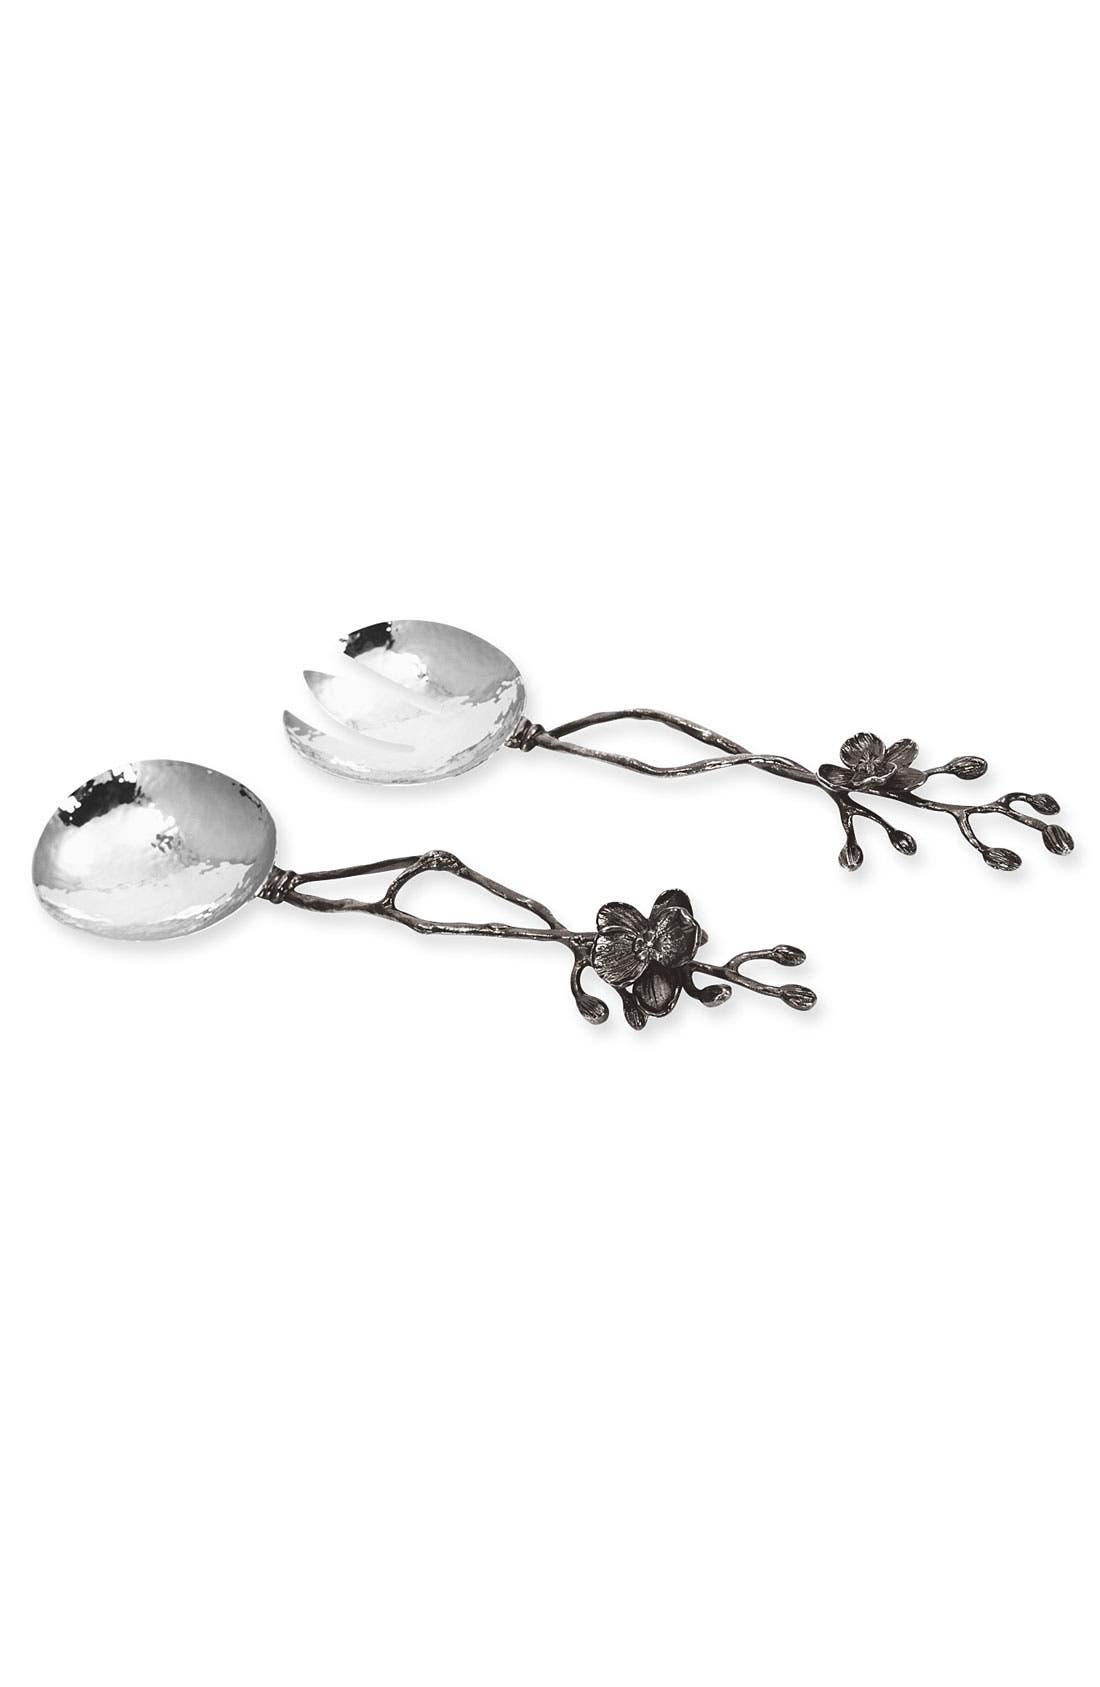 Michael Aram 'Black Orchid' 2-Piece Salad Serving Set